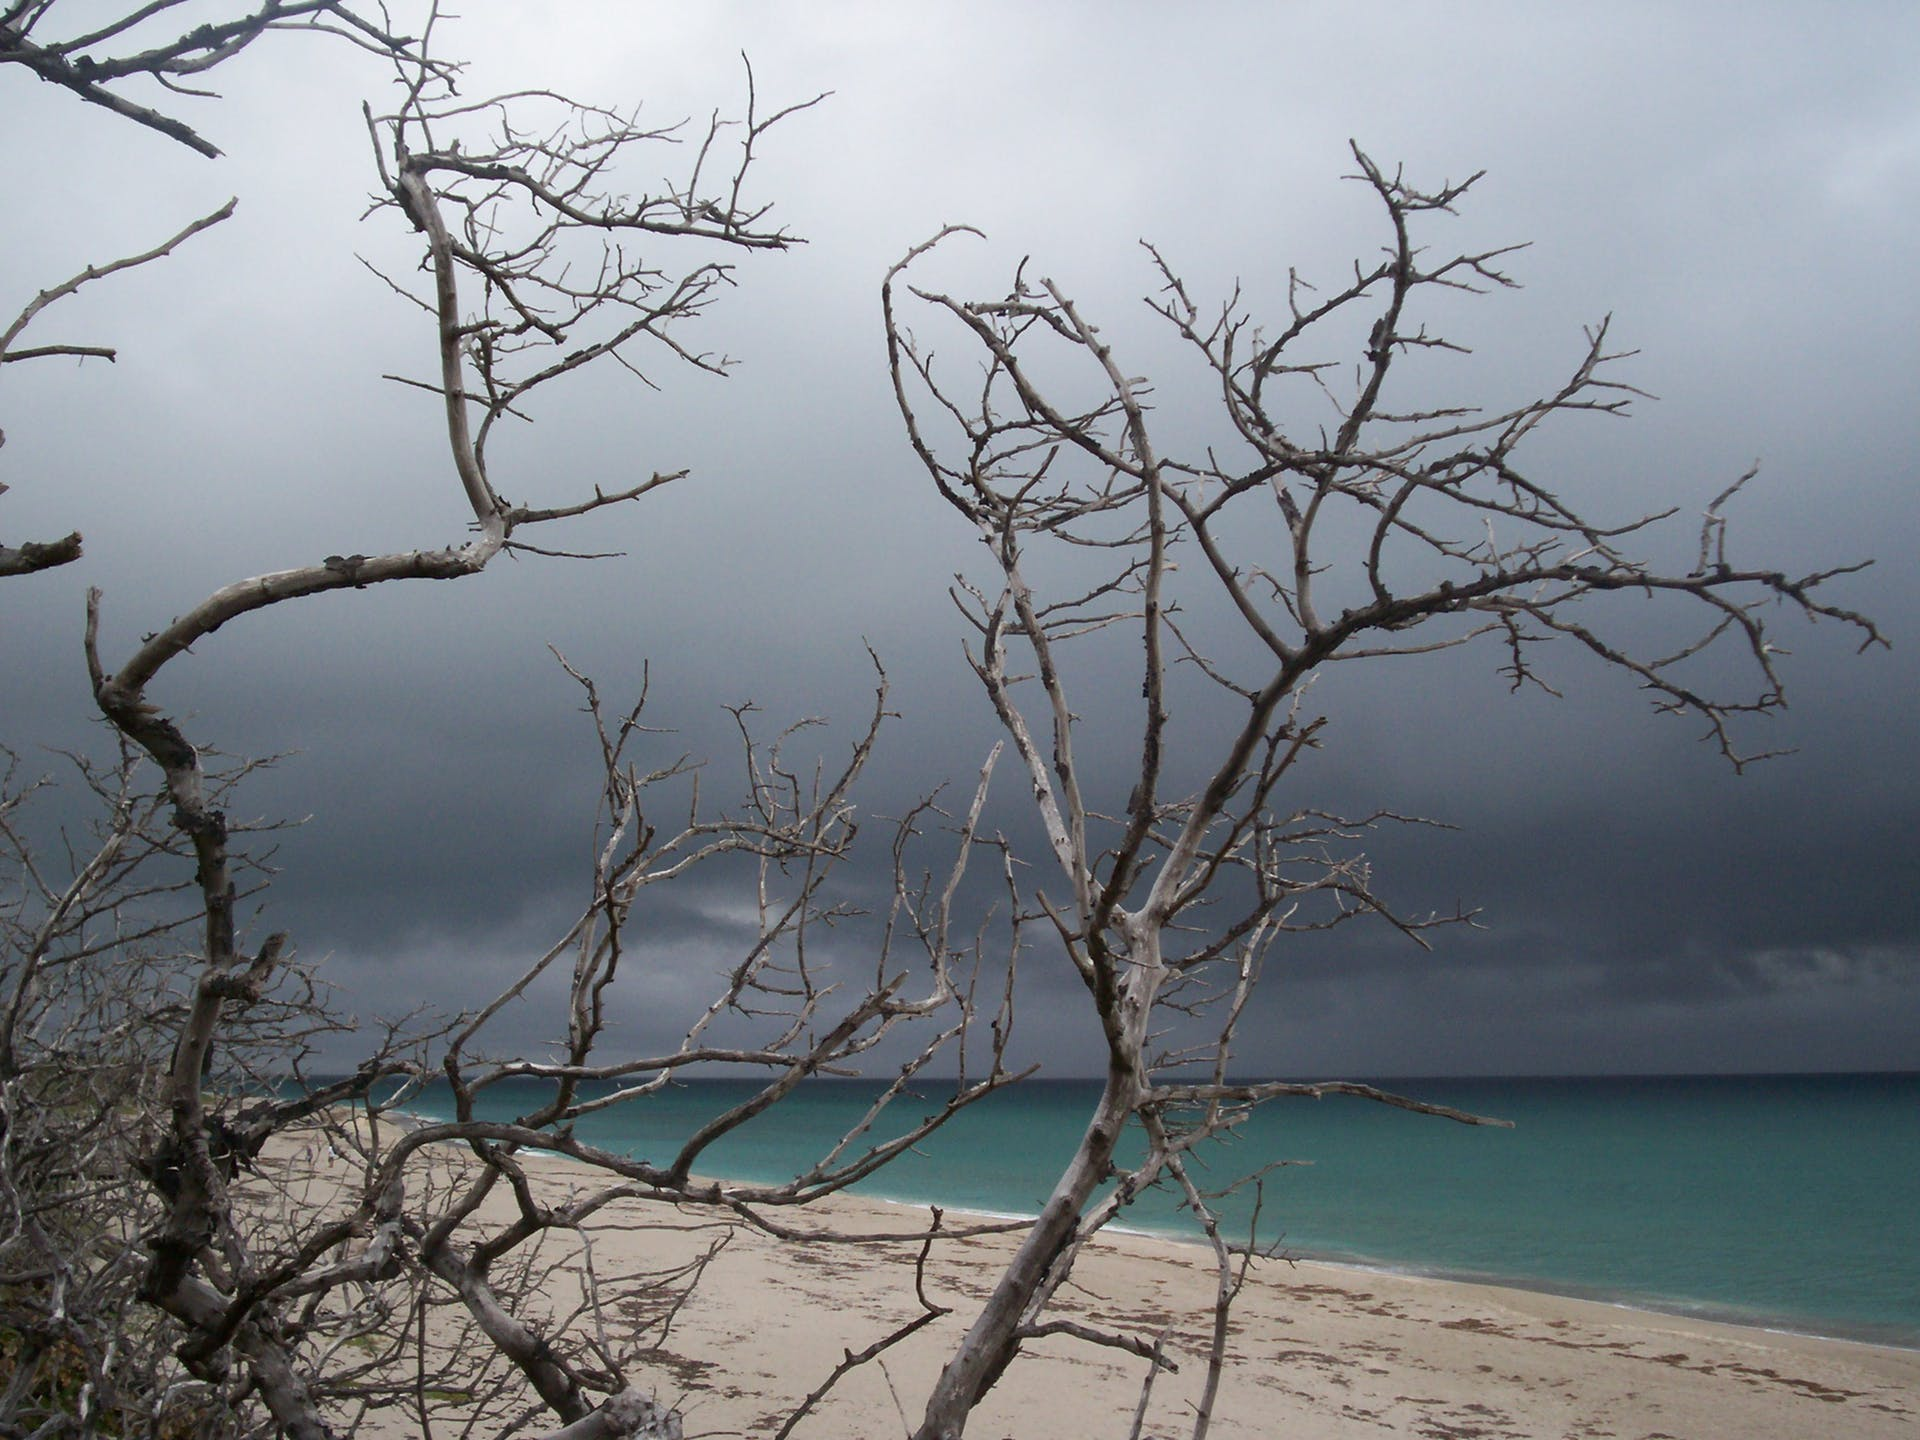 storm trees bare trees storm beach thunderstorm